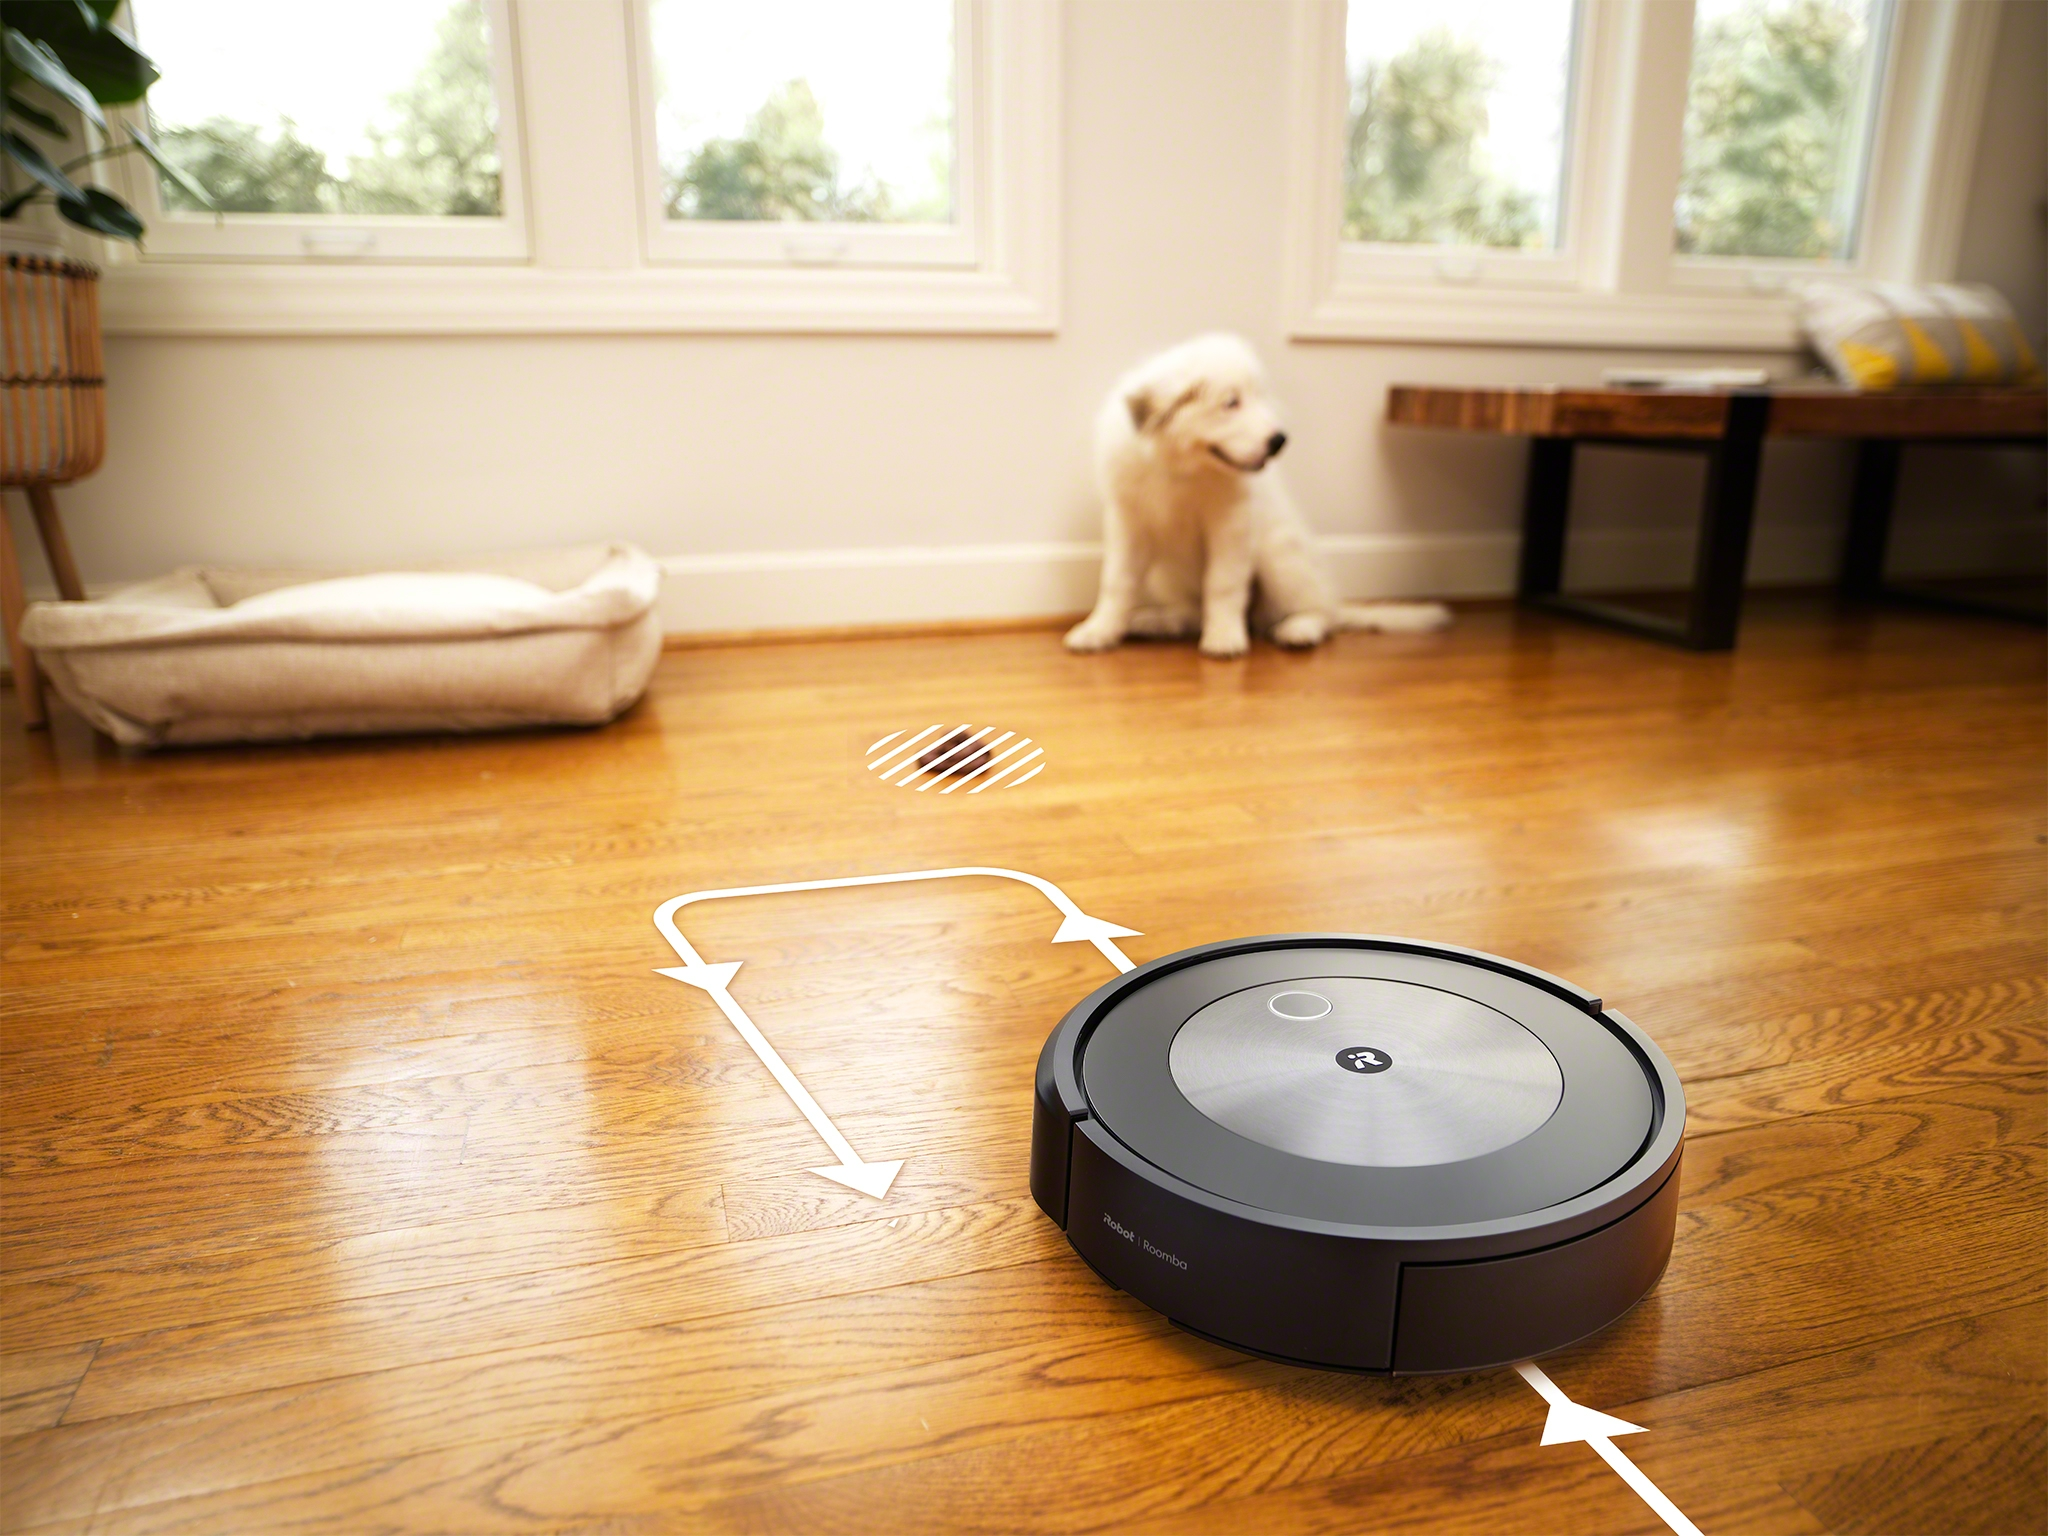 iRobot Introduces Roomba j7+ Robot Vacuum with Genius 3.0 Home Intelligence